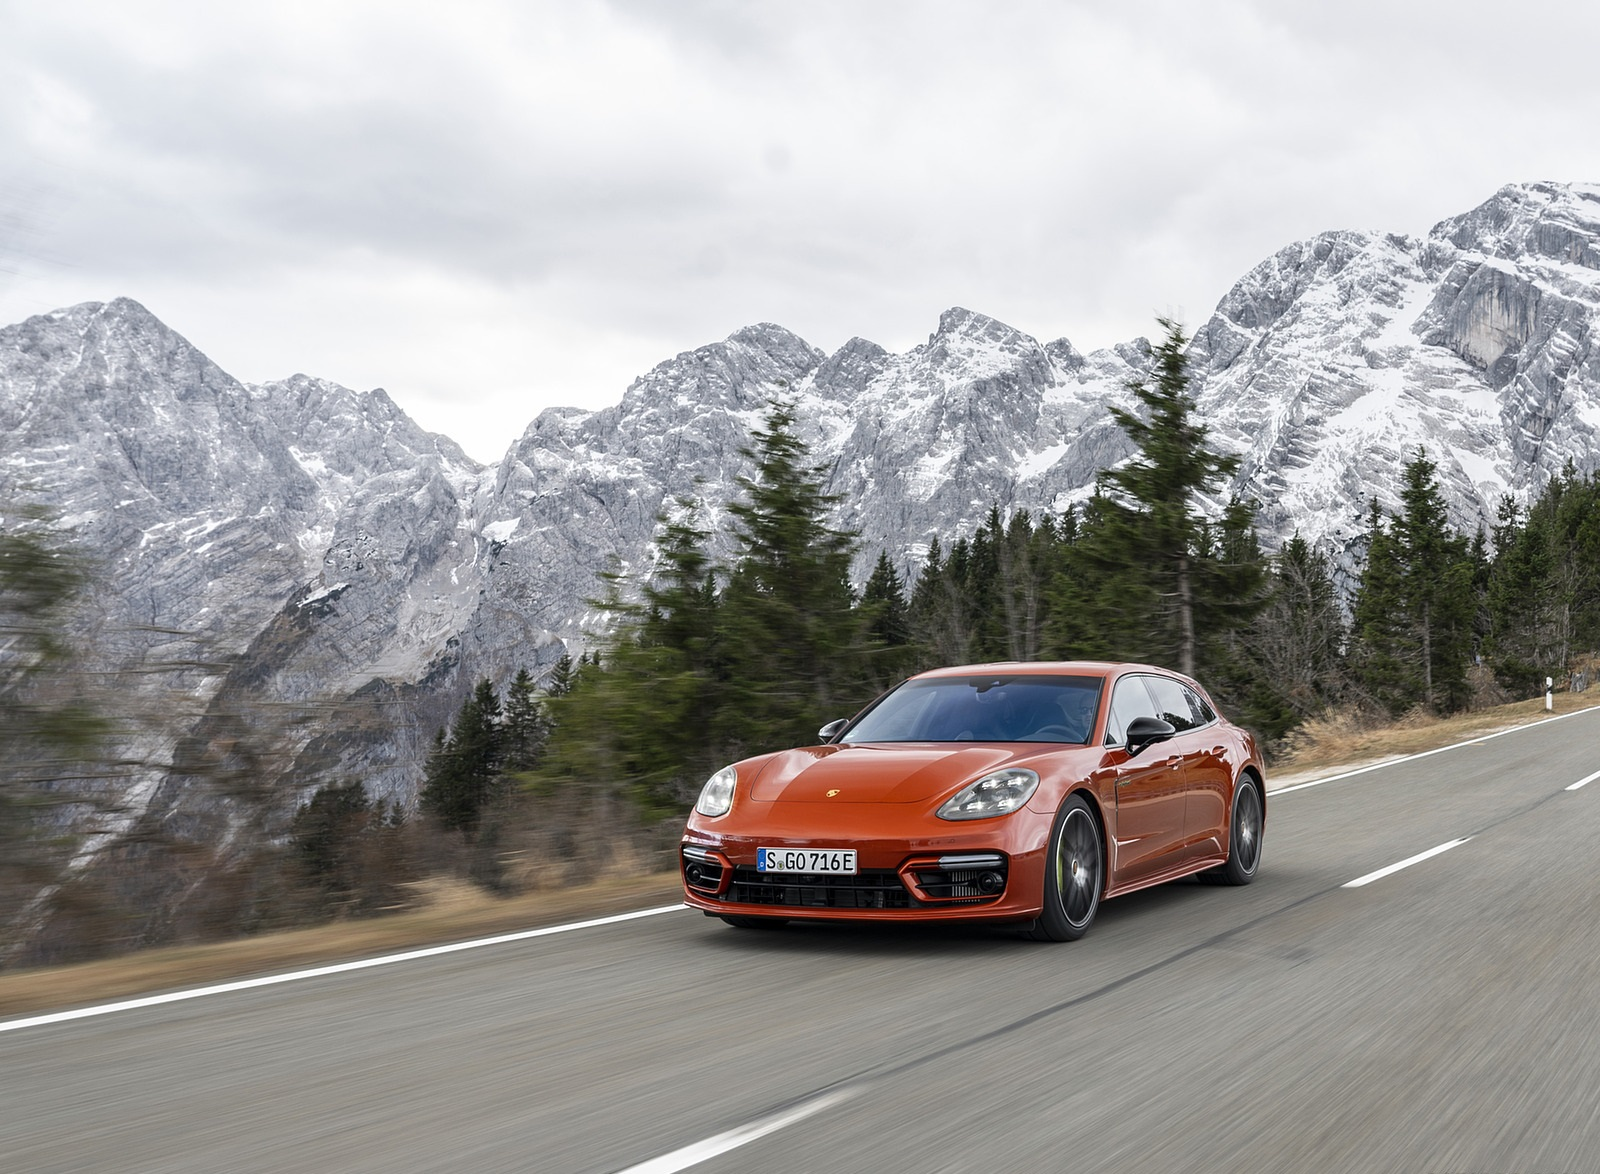 2021 Porsche Panamera 4 E-Hybrid Sport Turismo (Color: Papaya Metallic) Front Three-Quarter Wallpapers (3)